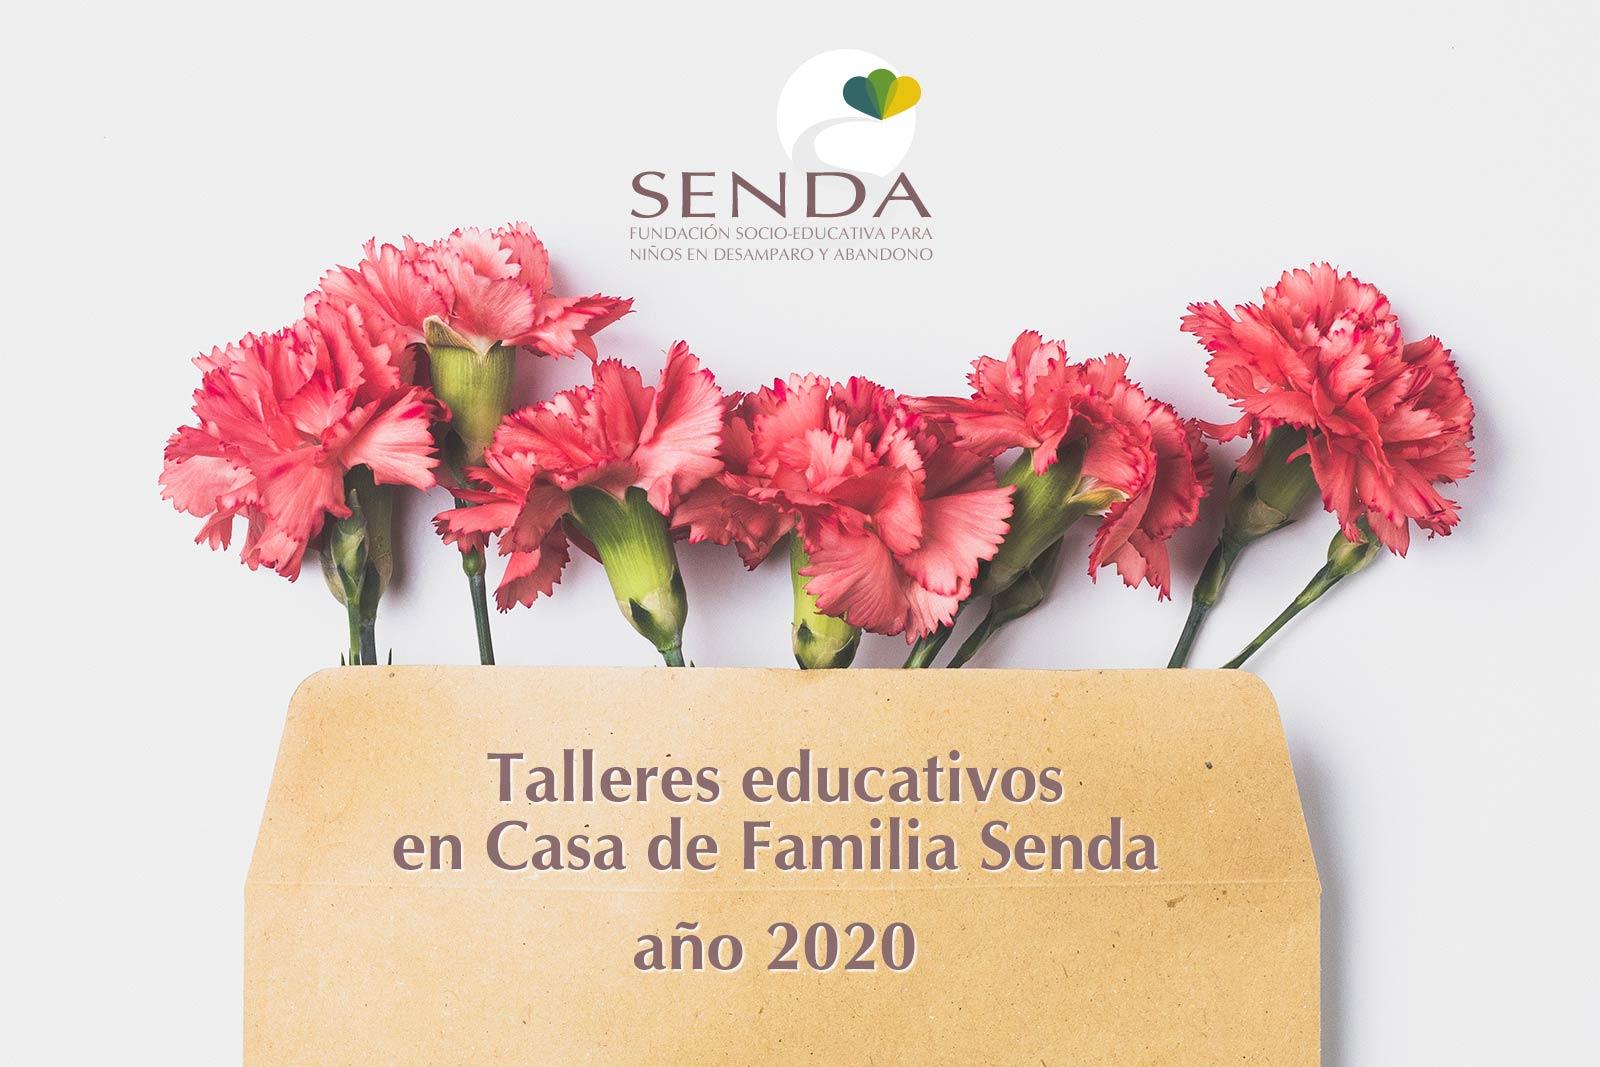 talleres-educativos-2020-menores-casa-familia-montoro-fundacion-senda